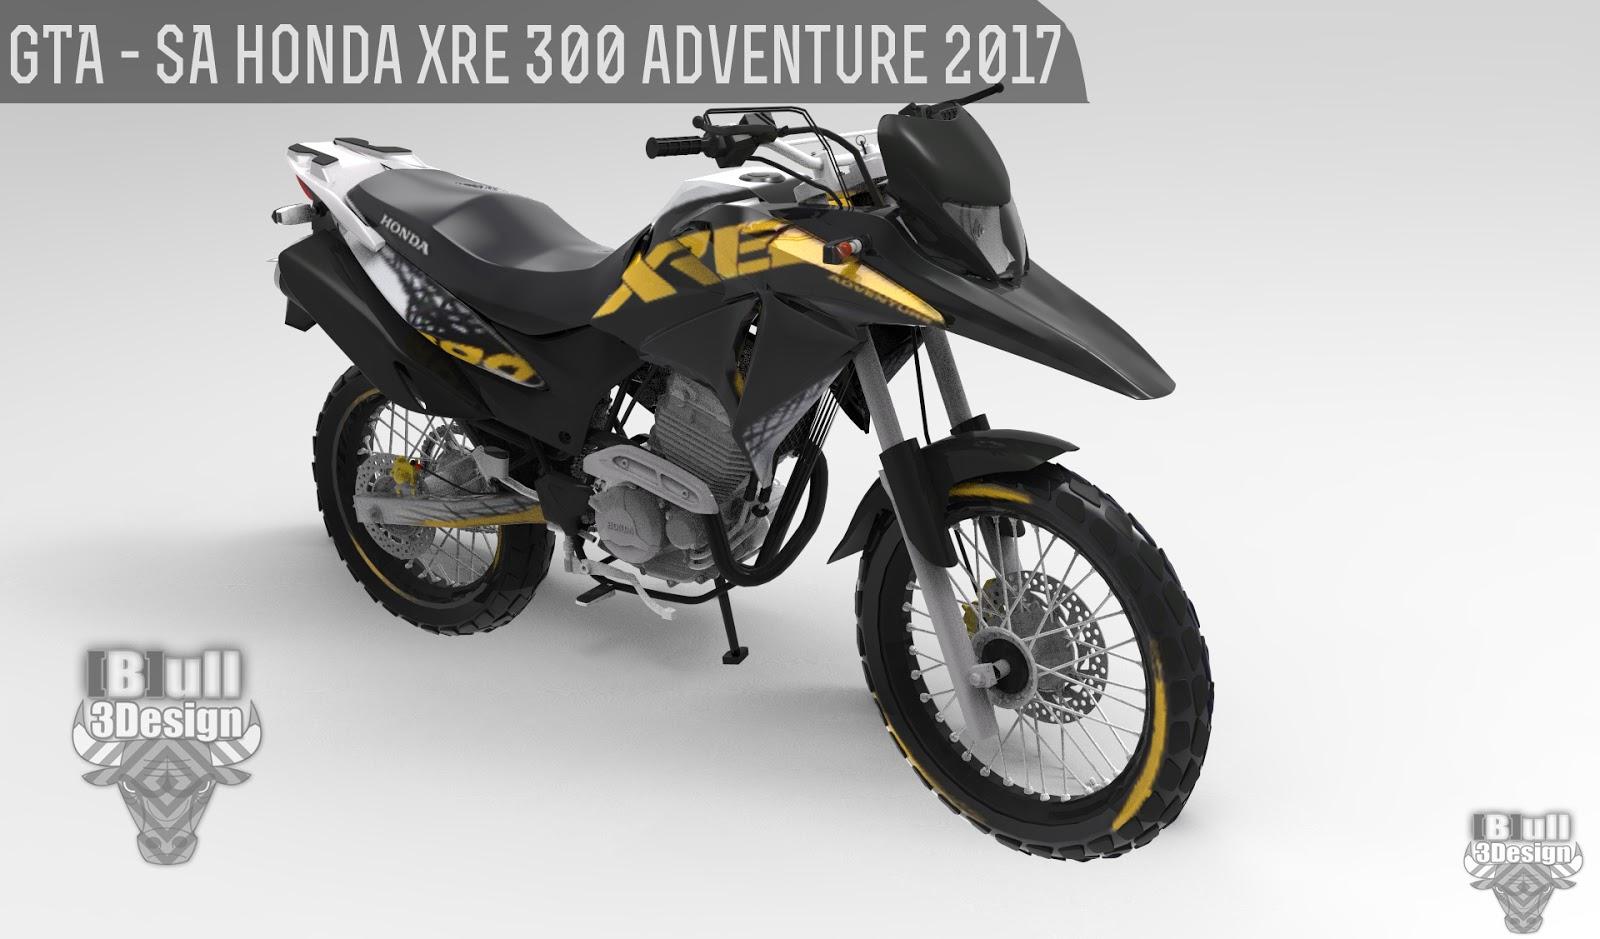 Honda San Marcos >> GTA SA -200K - HONDA XRE 300 ADVENTURE 2017 EXCLUSIVA ...